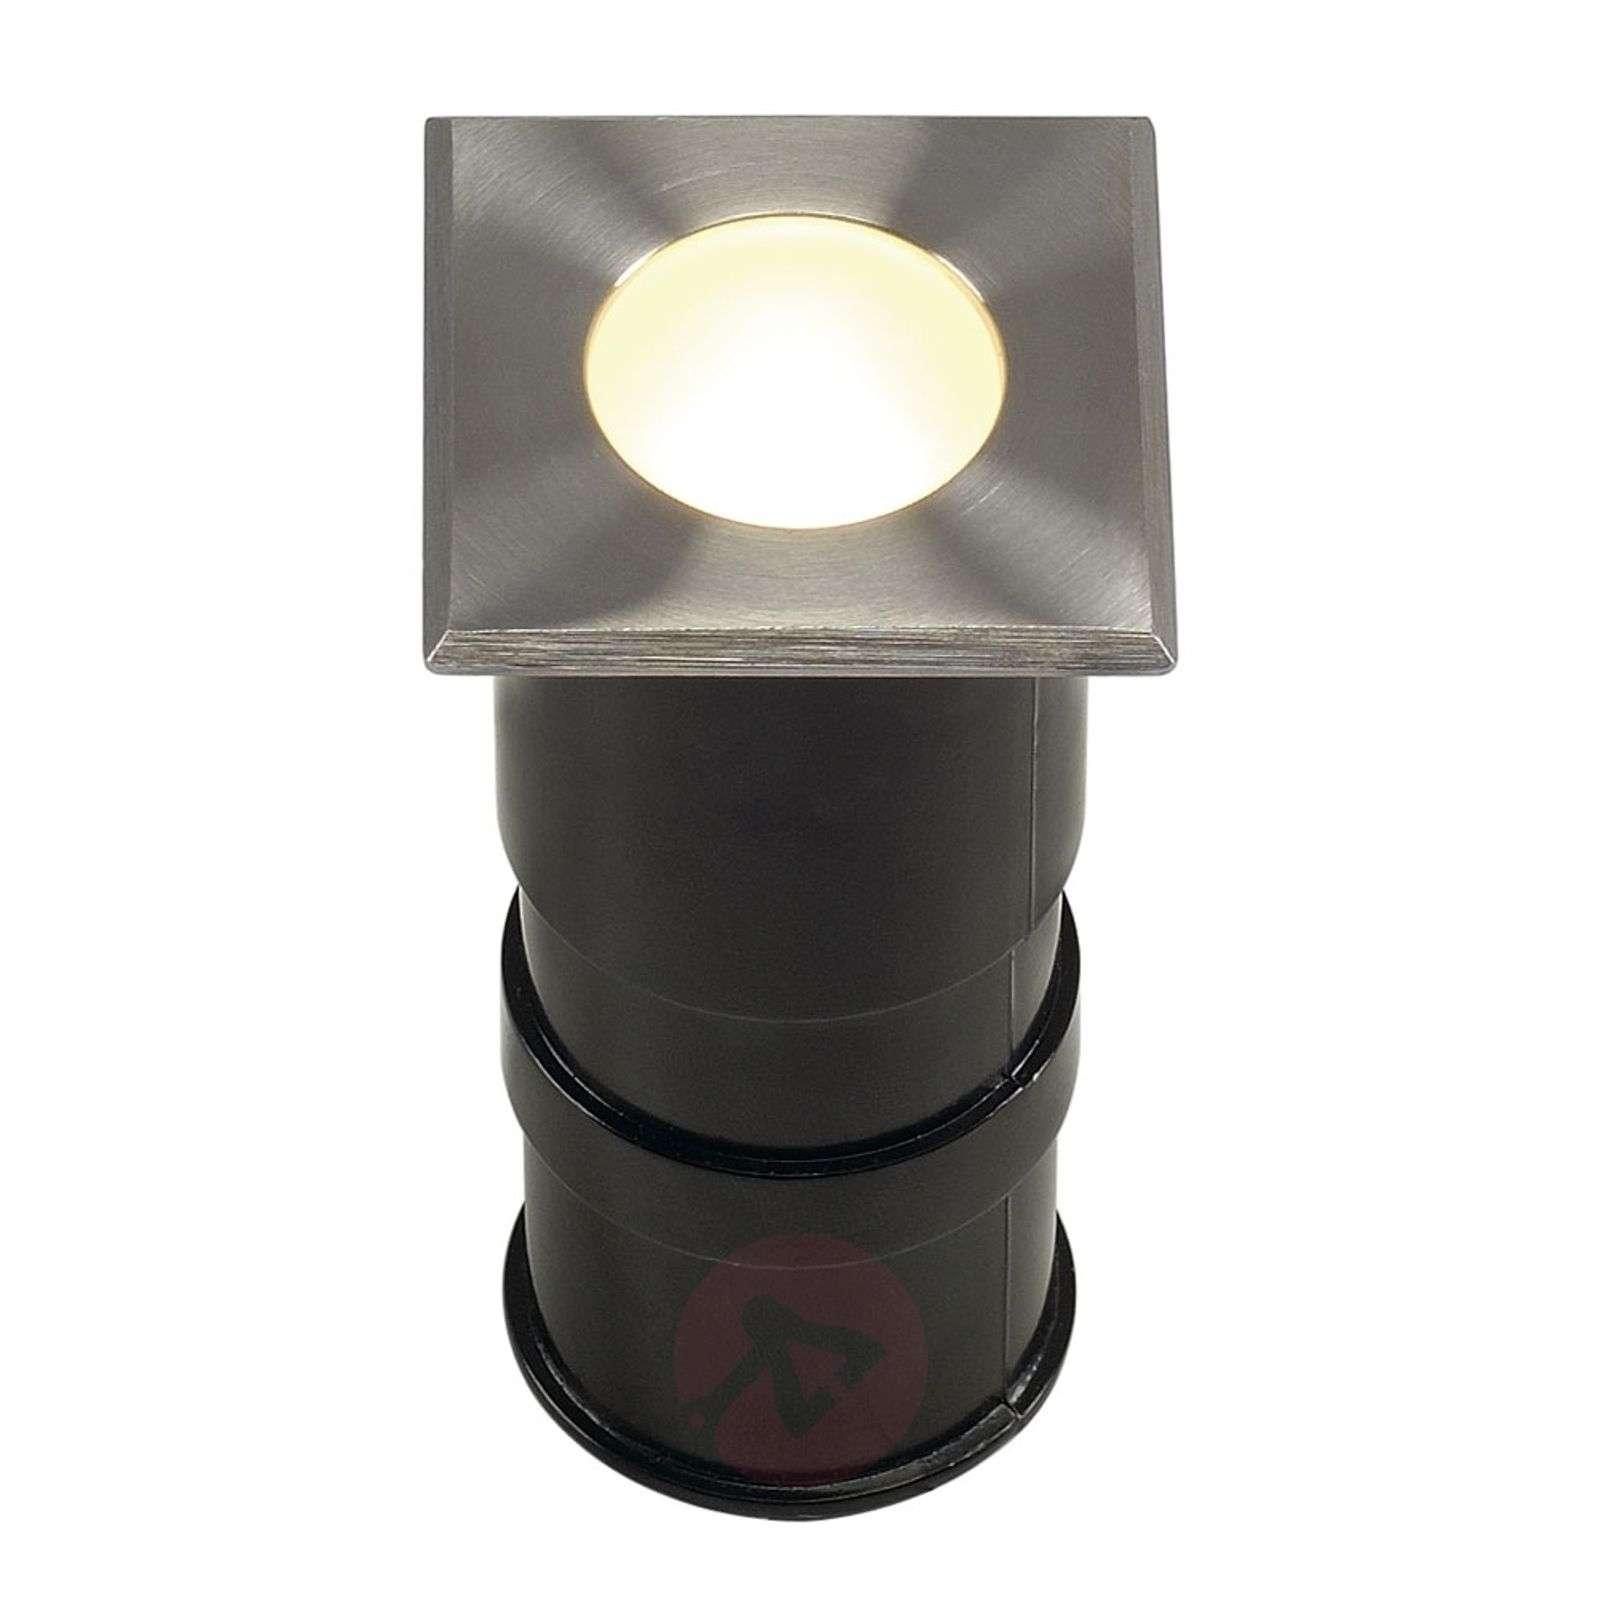 LED-uppovalo POWER TRAIL-LITE Square, läm.valk.-5504379-01